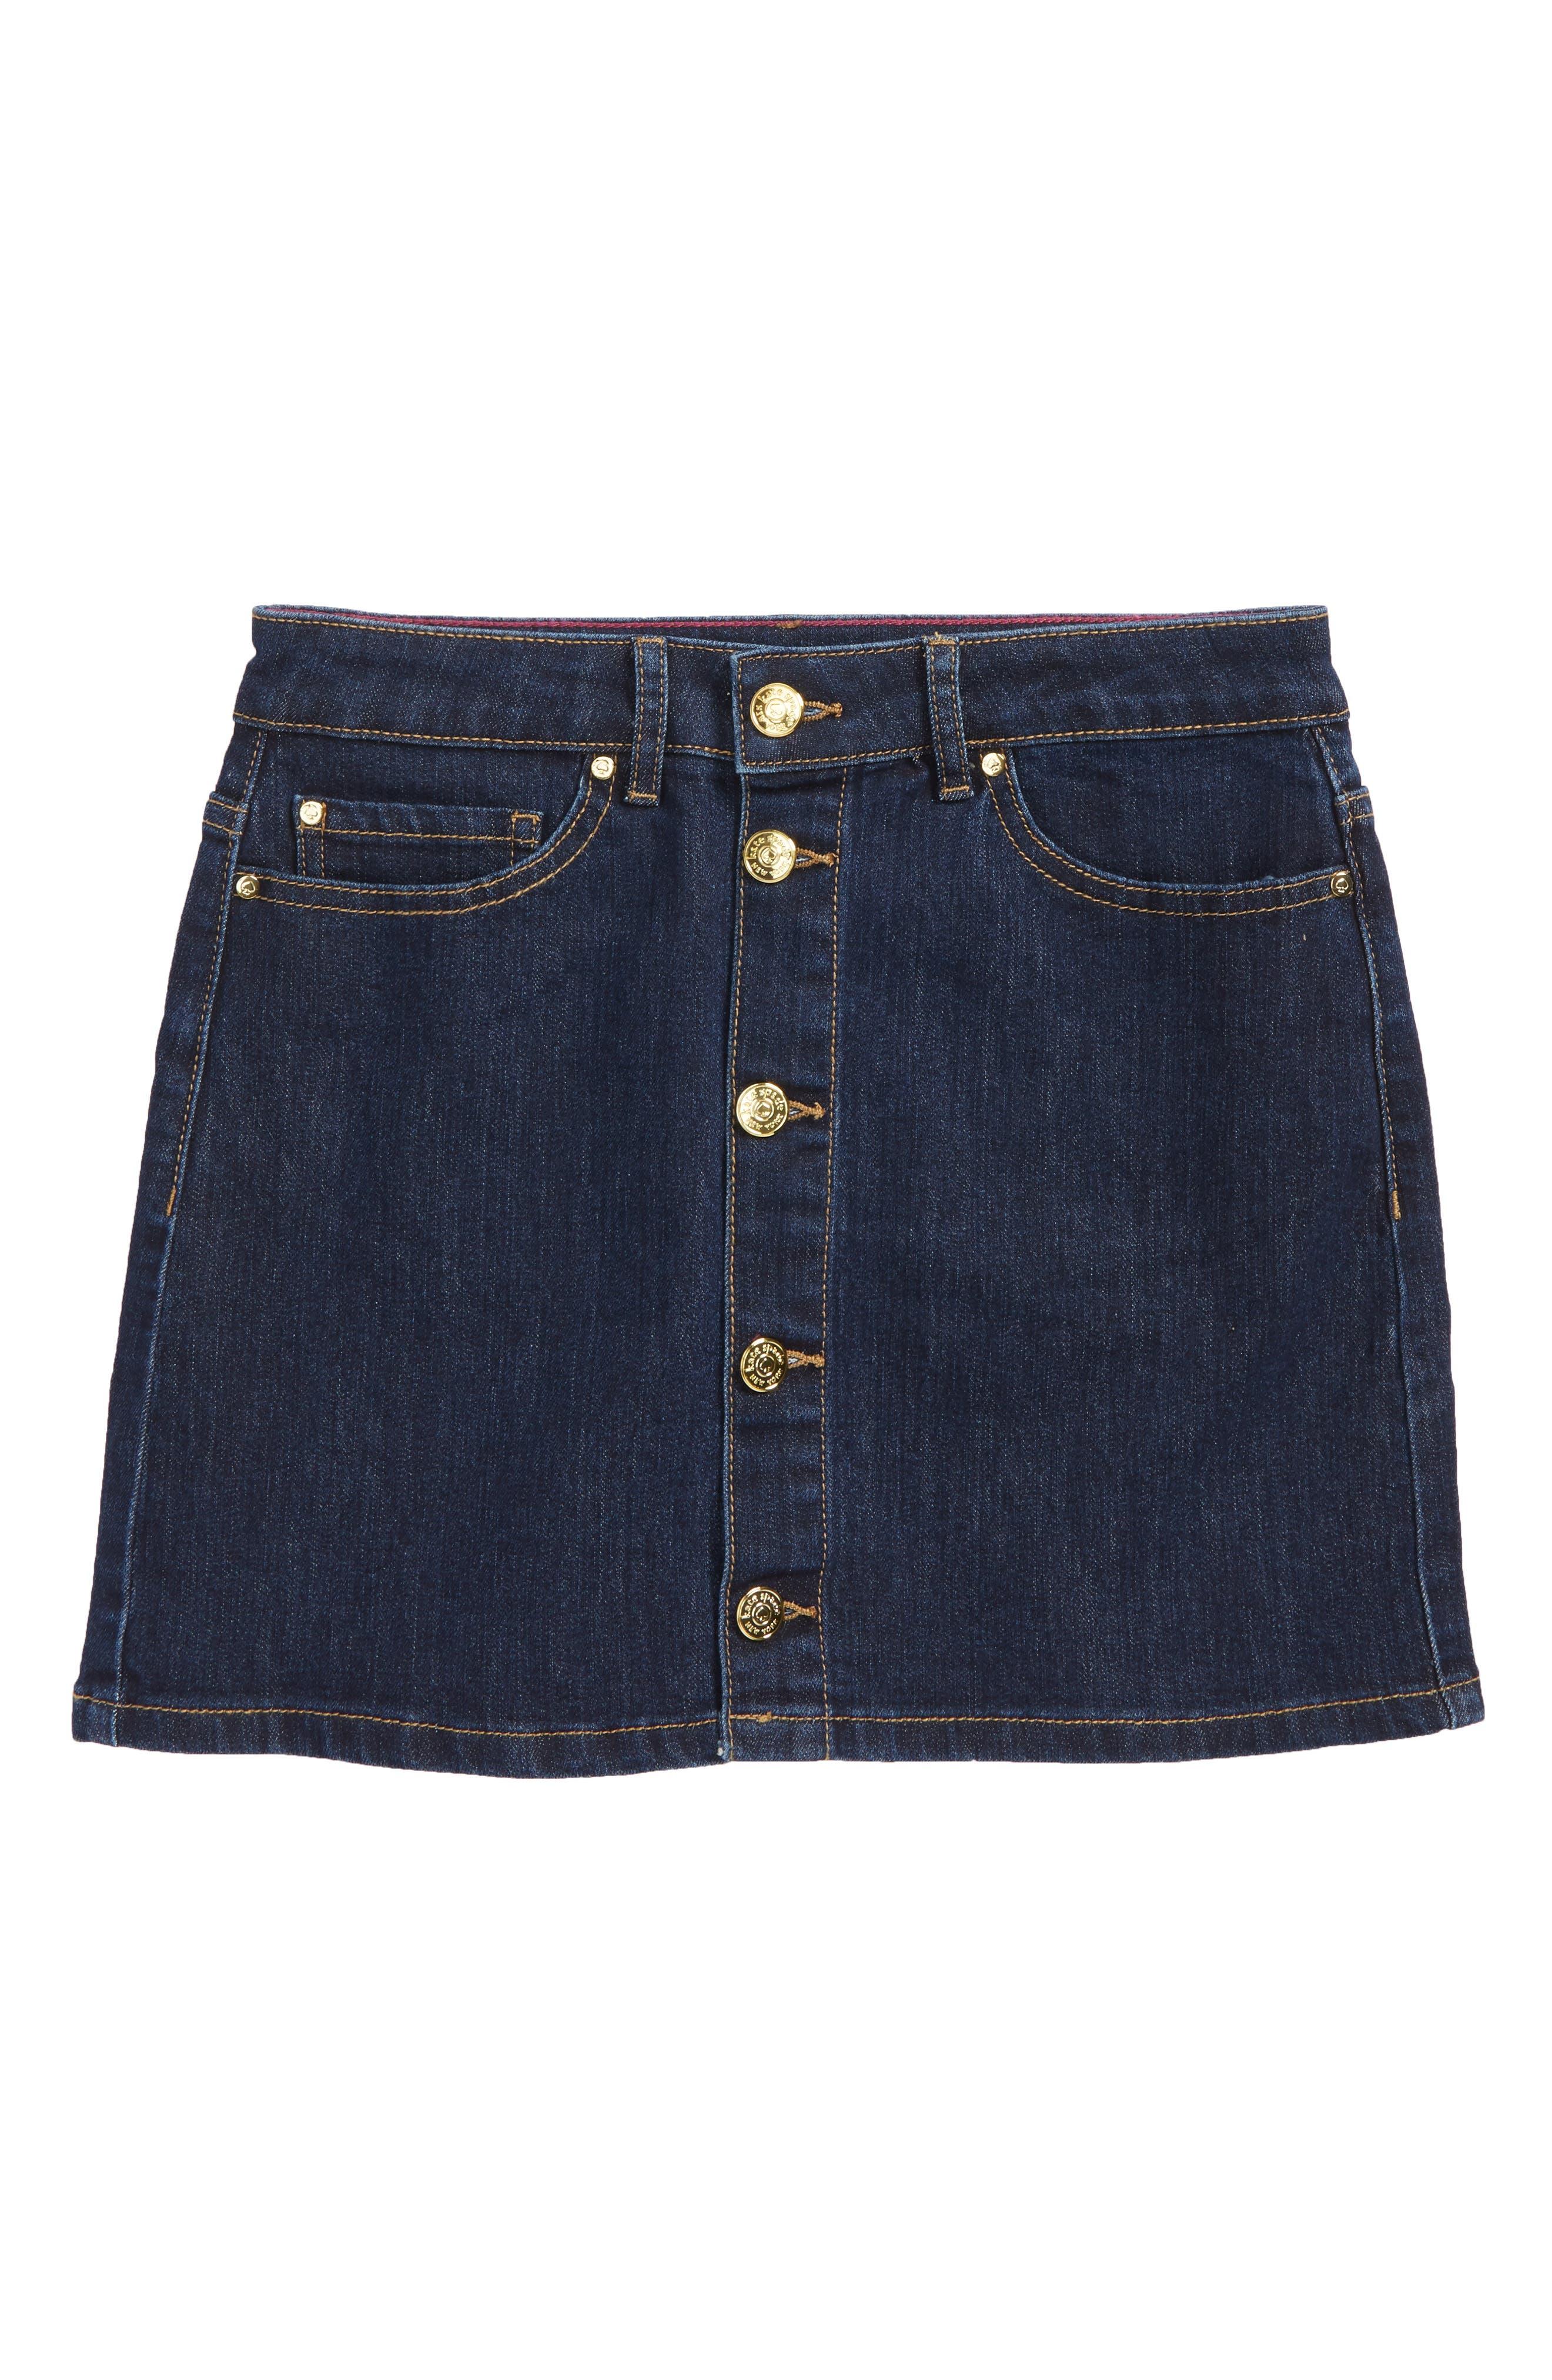 kate spade new york denim skirt (Big Girls)